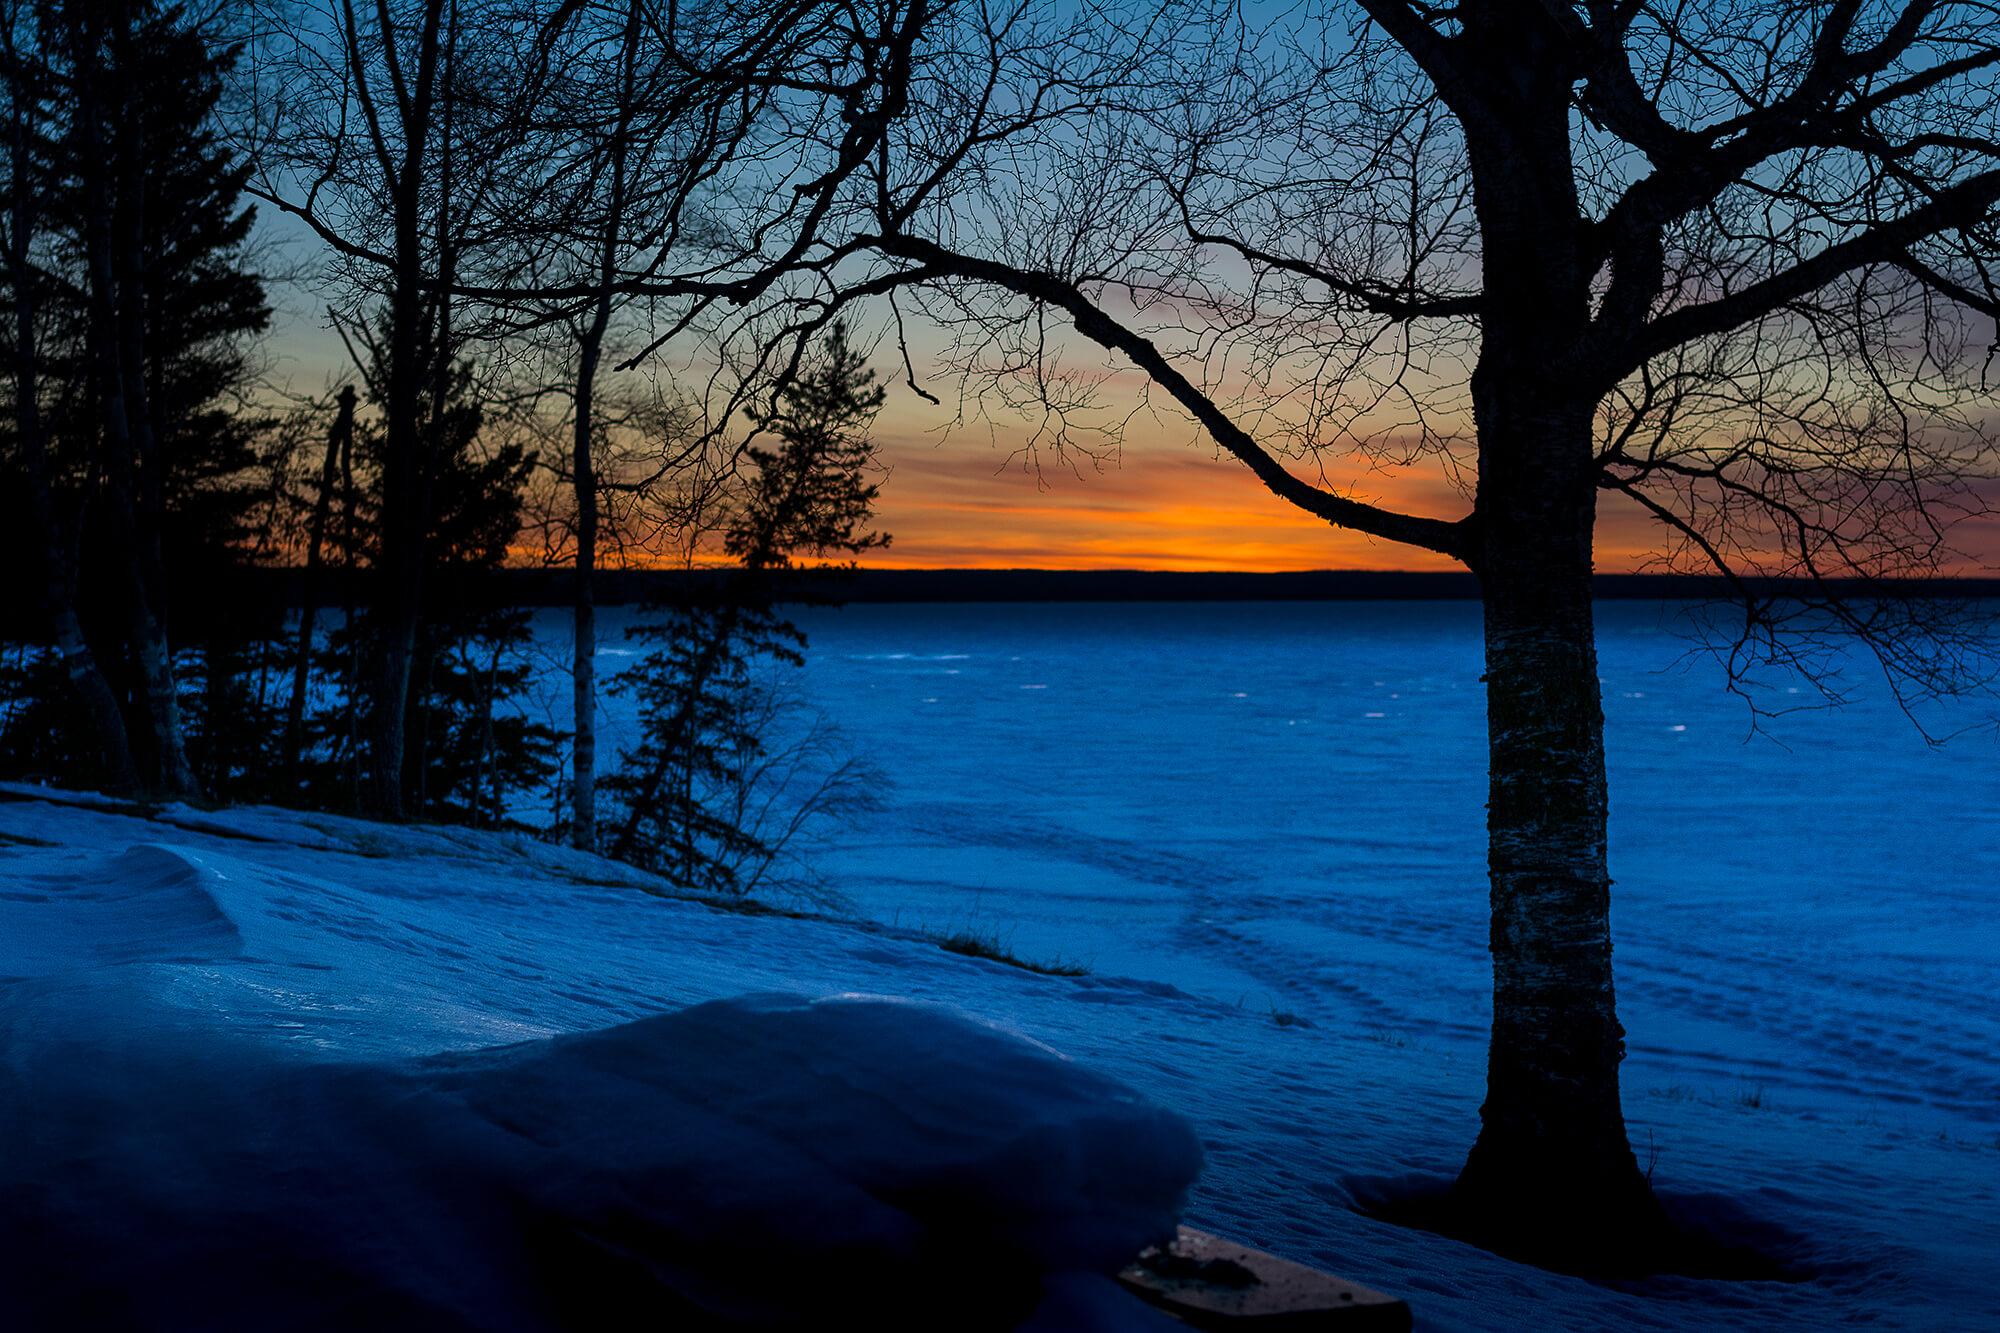 McDougall_Sunset Beach Silhouette-2752.jpg